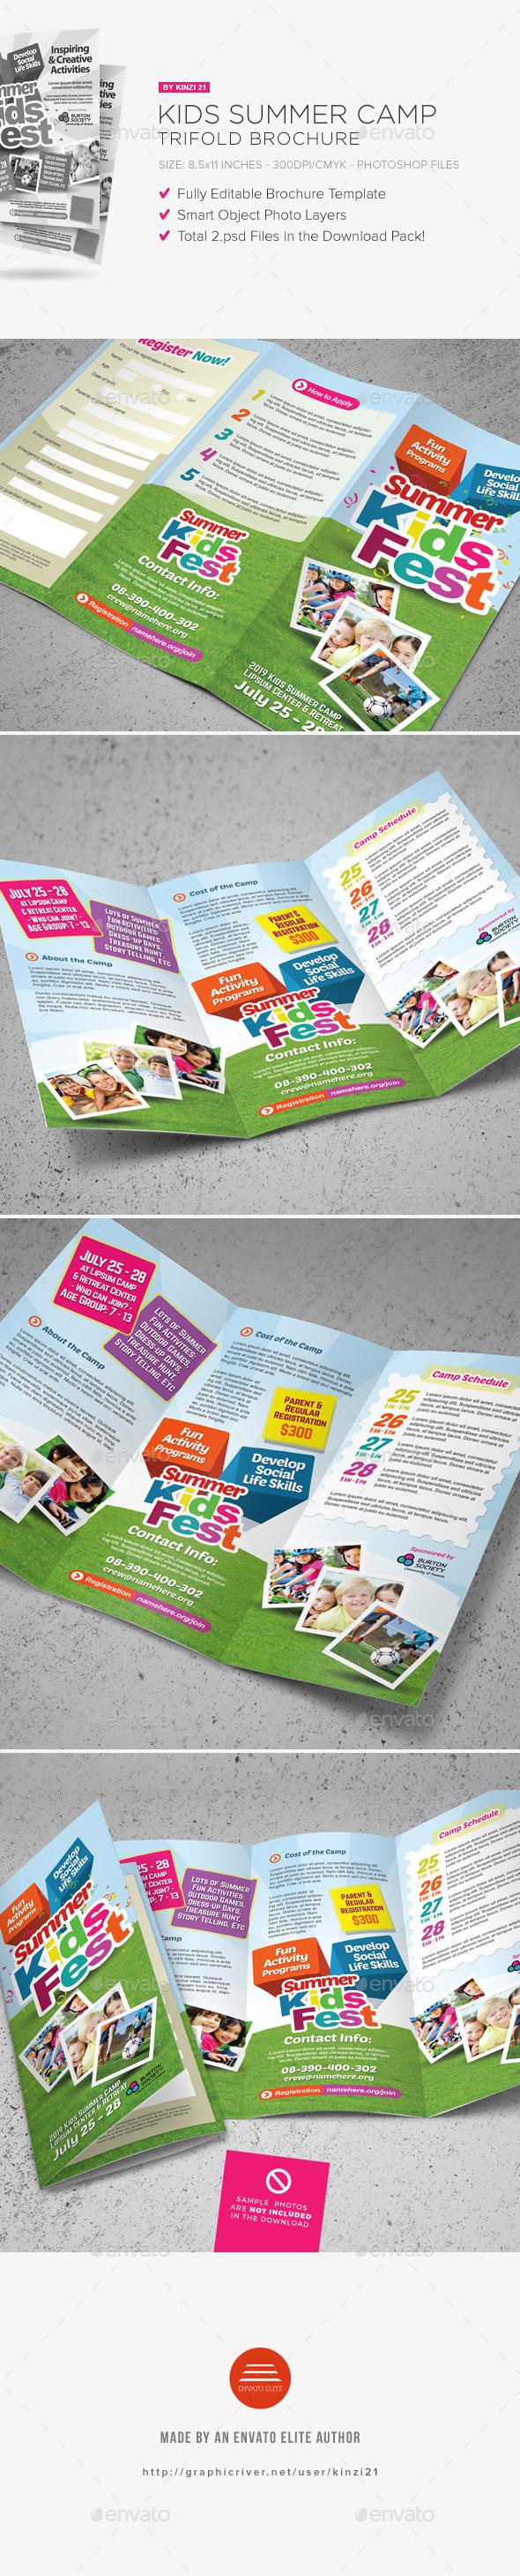 Kids Summer Camp Trifold Brochure